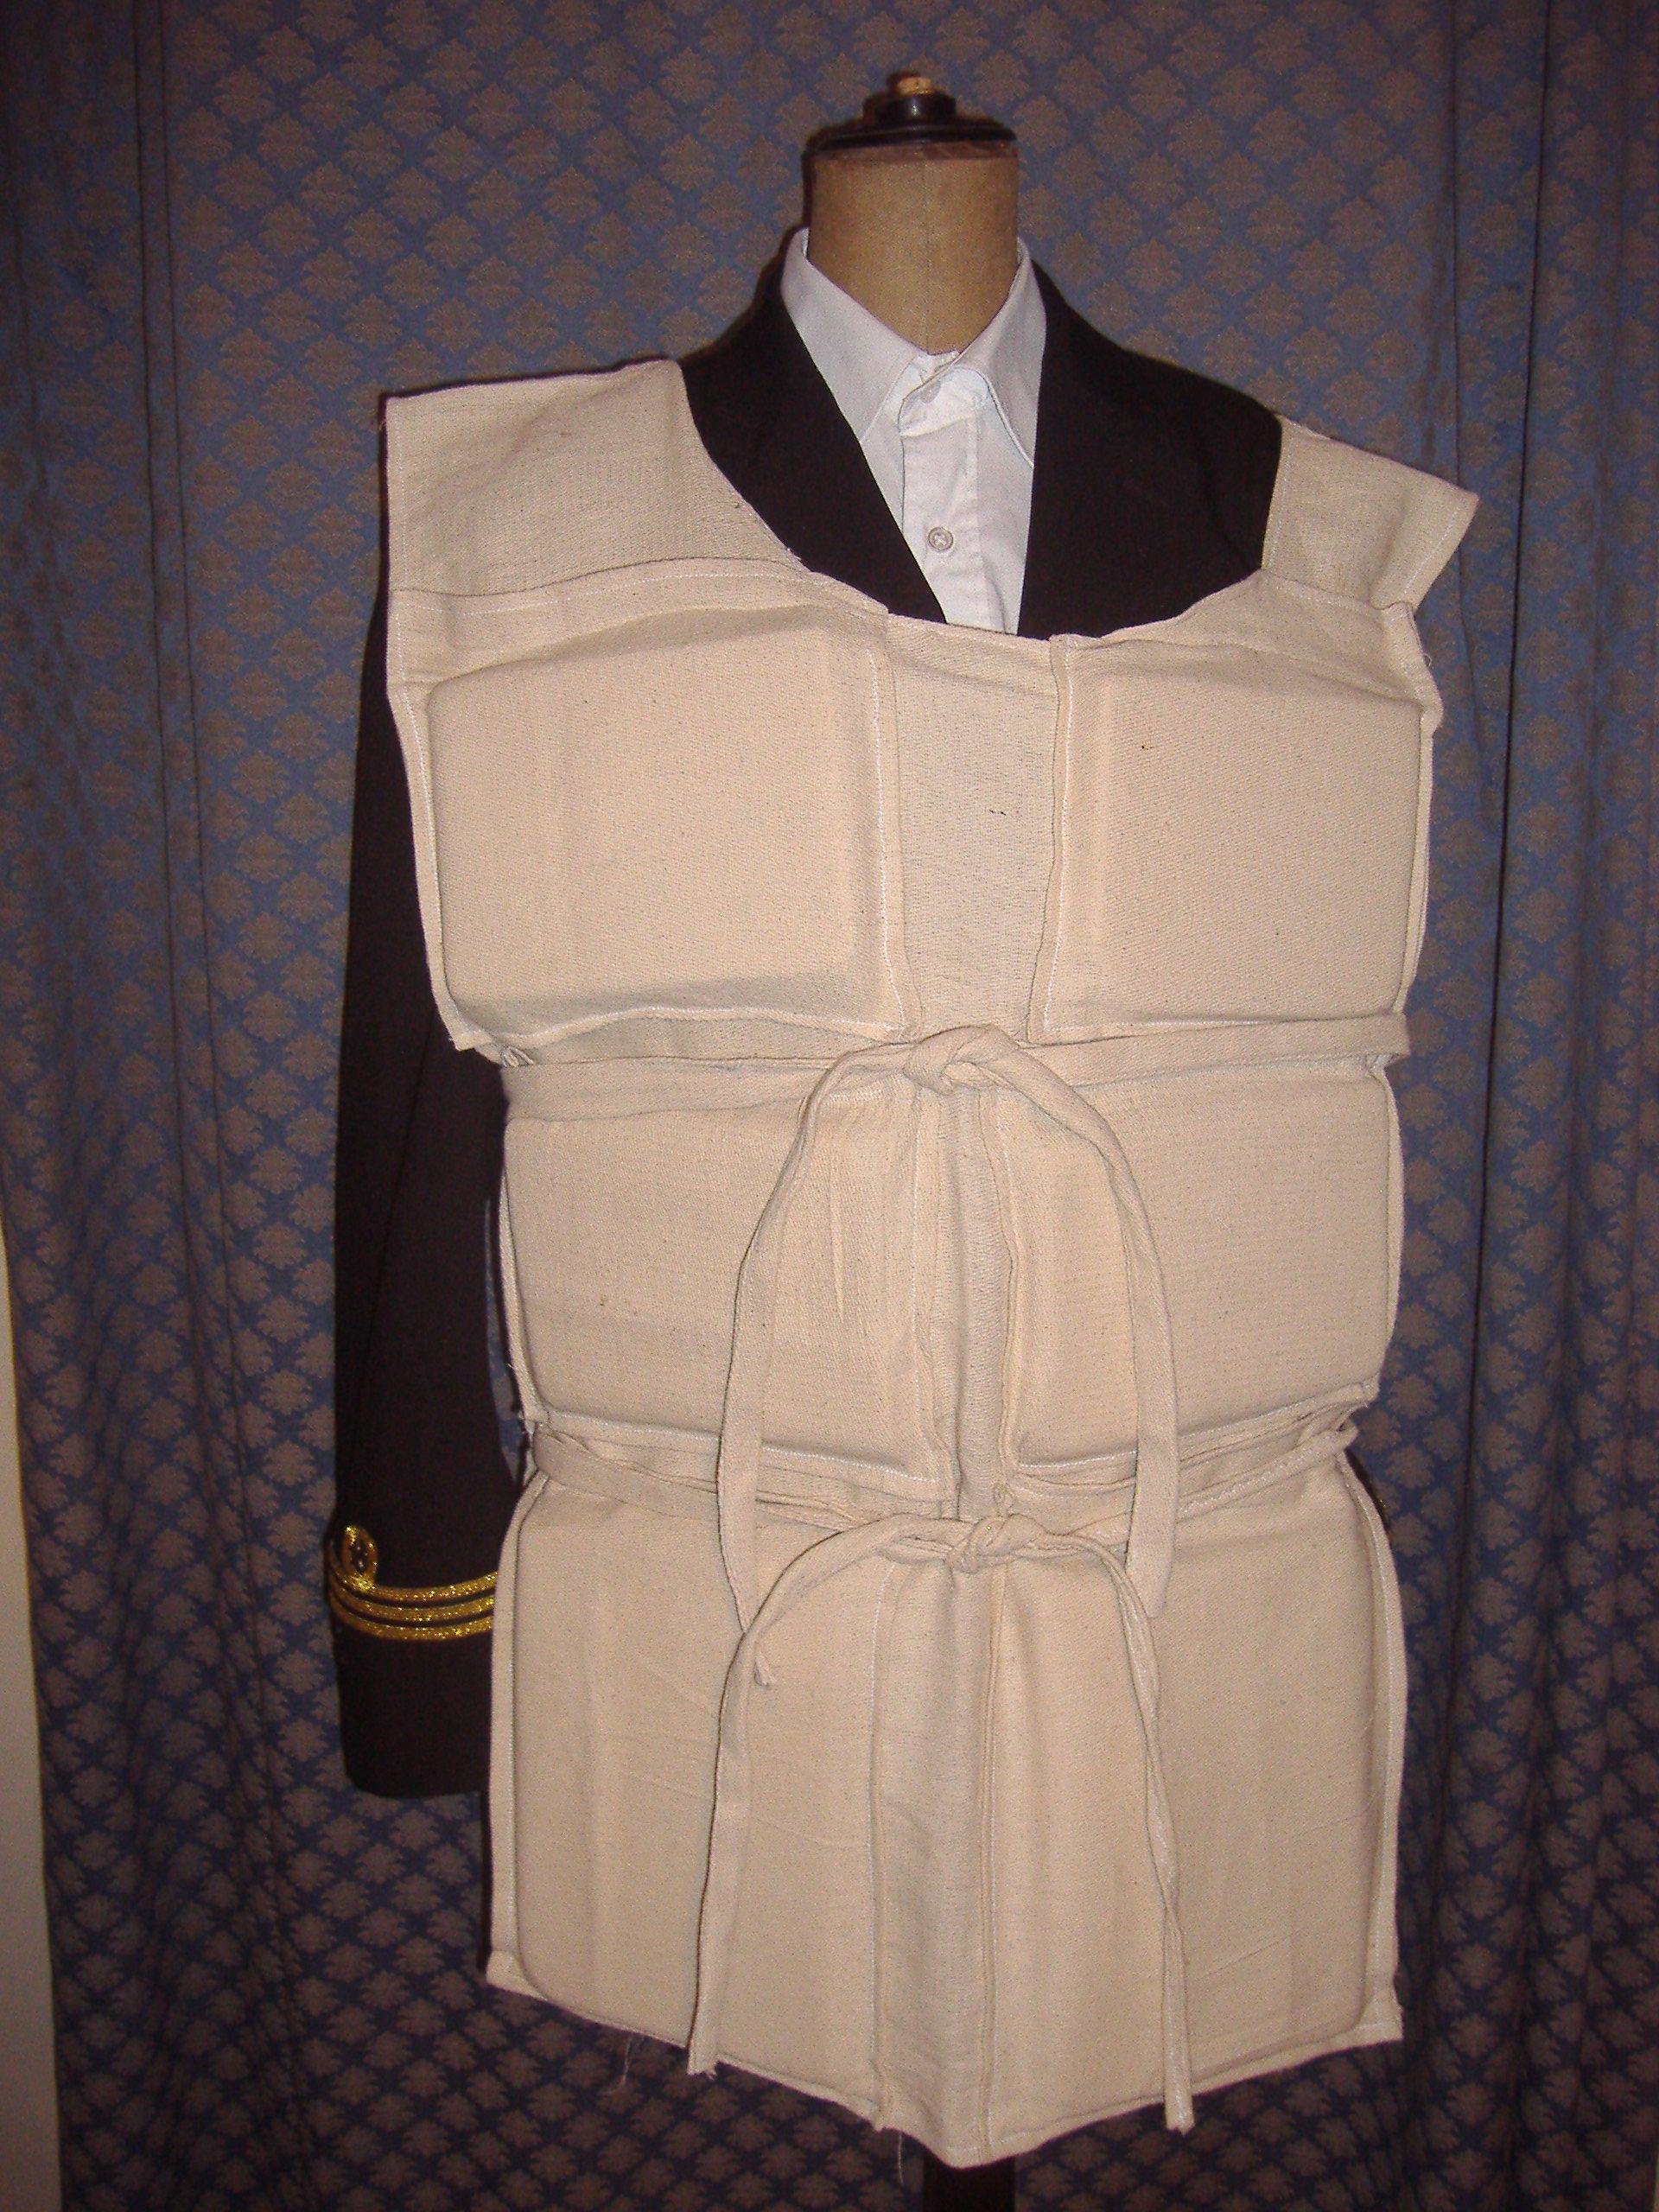 titanic life jacket rms titanicbulletproof vesthalloween - Halloween Bullet Proof Vest